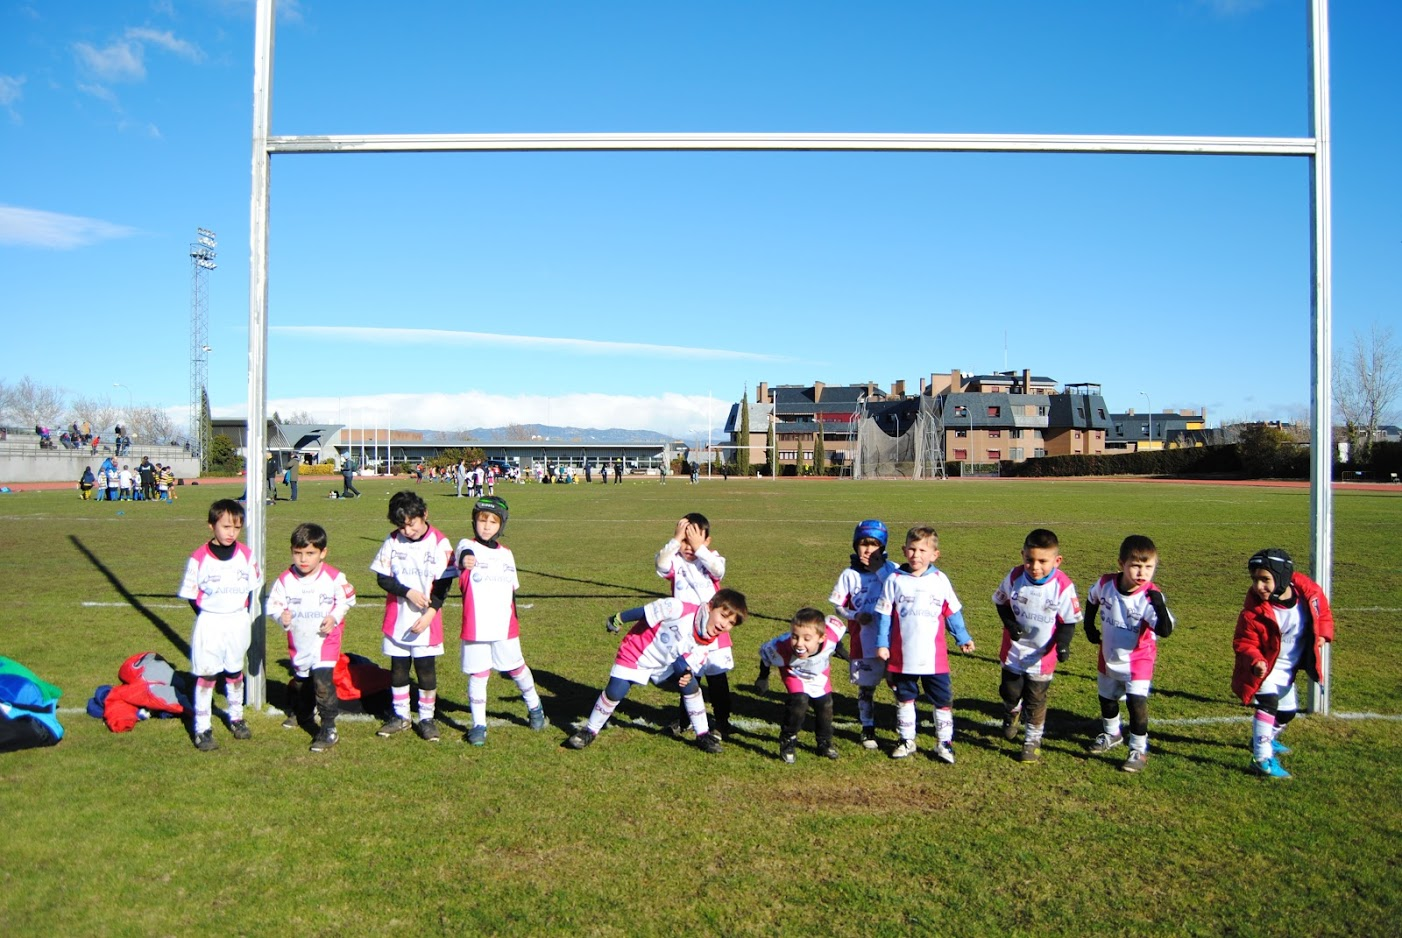 Los Quijotes, en el Festival de Rugby Infantil en Majadahonda